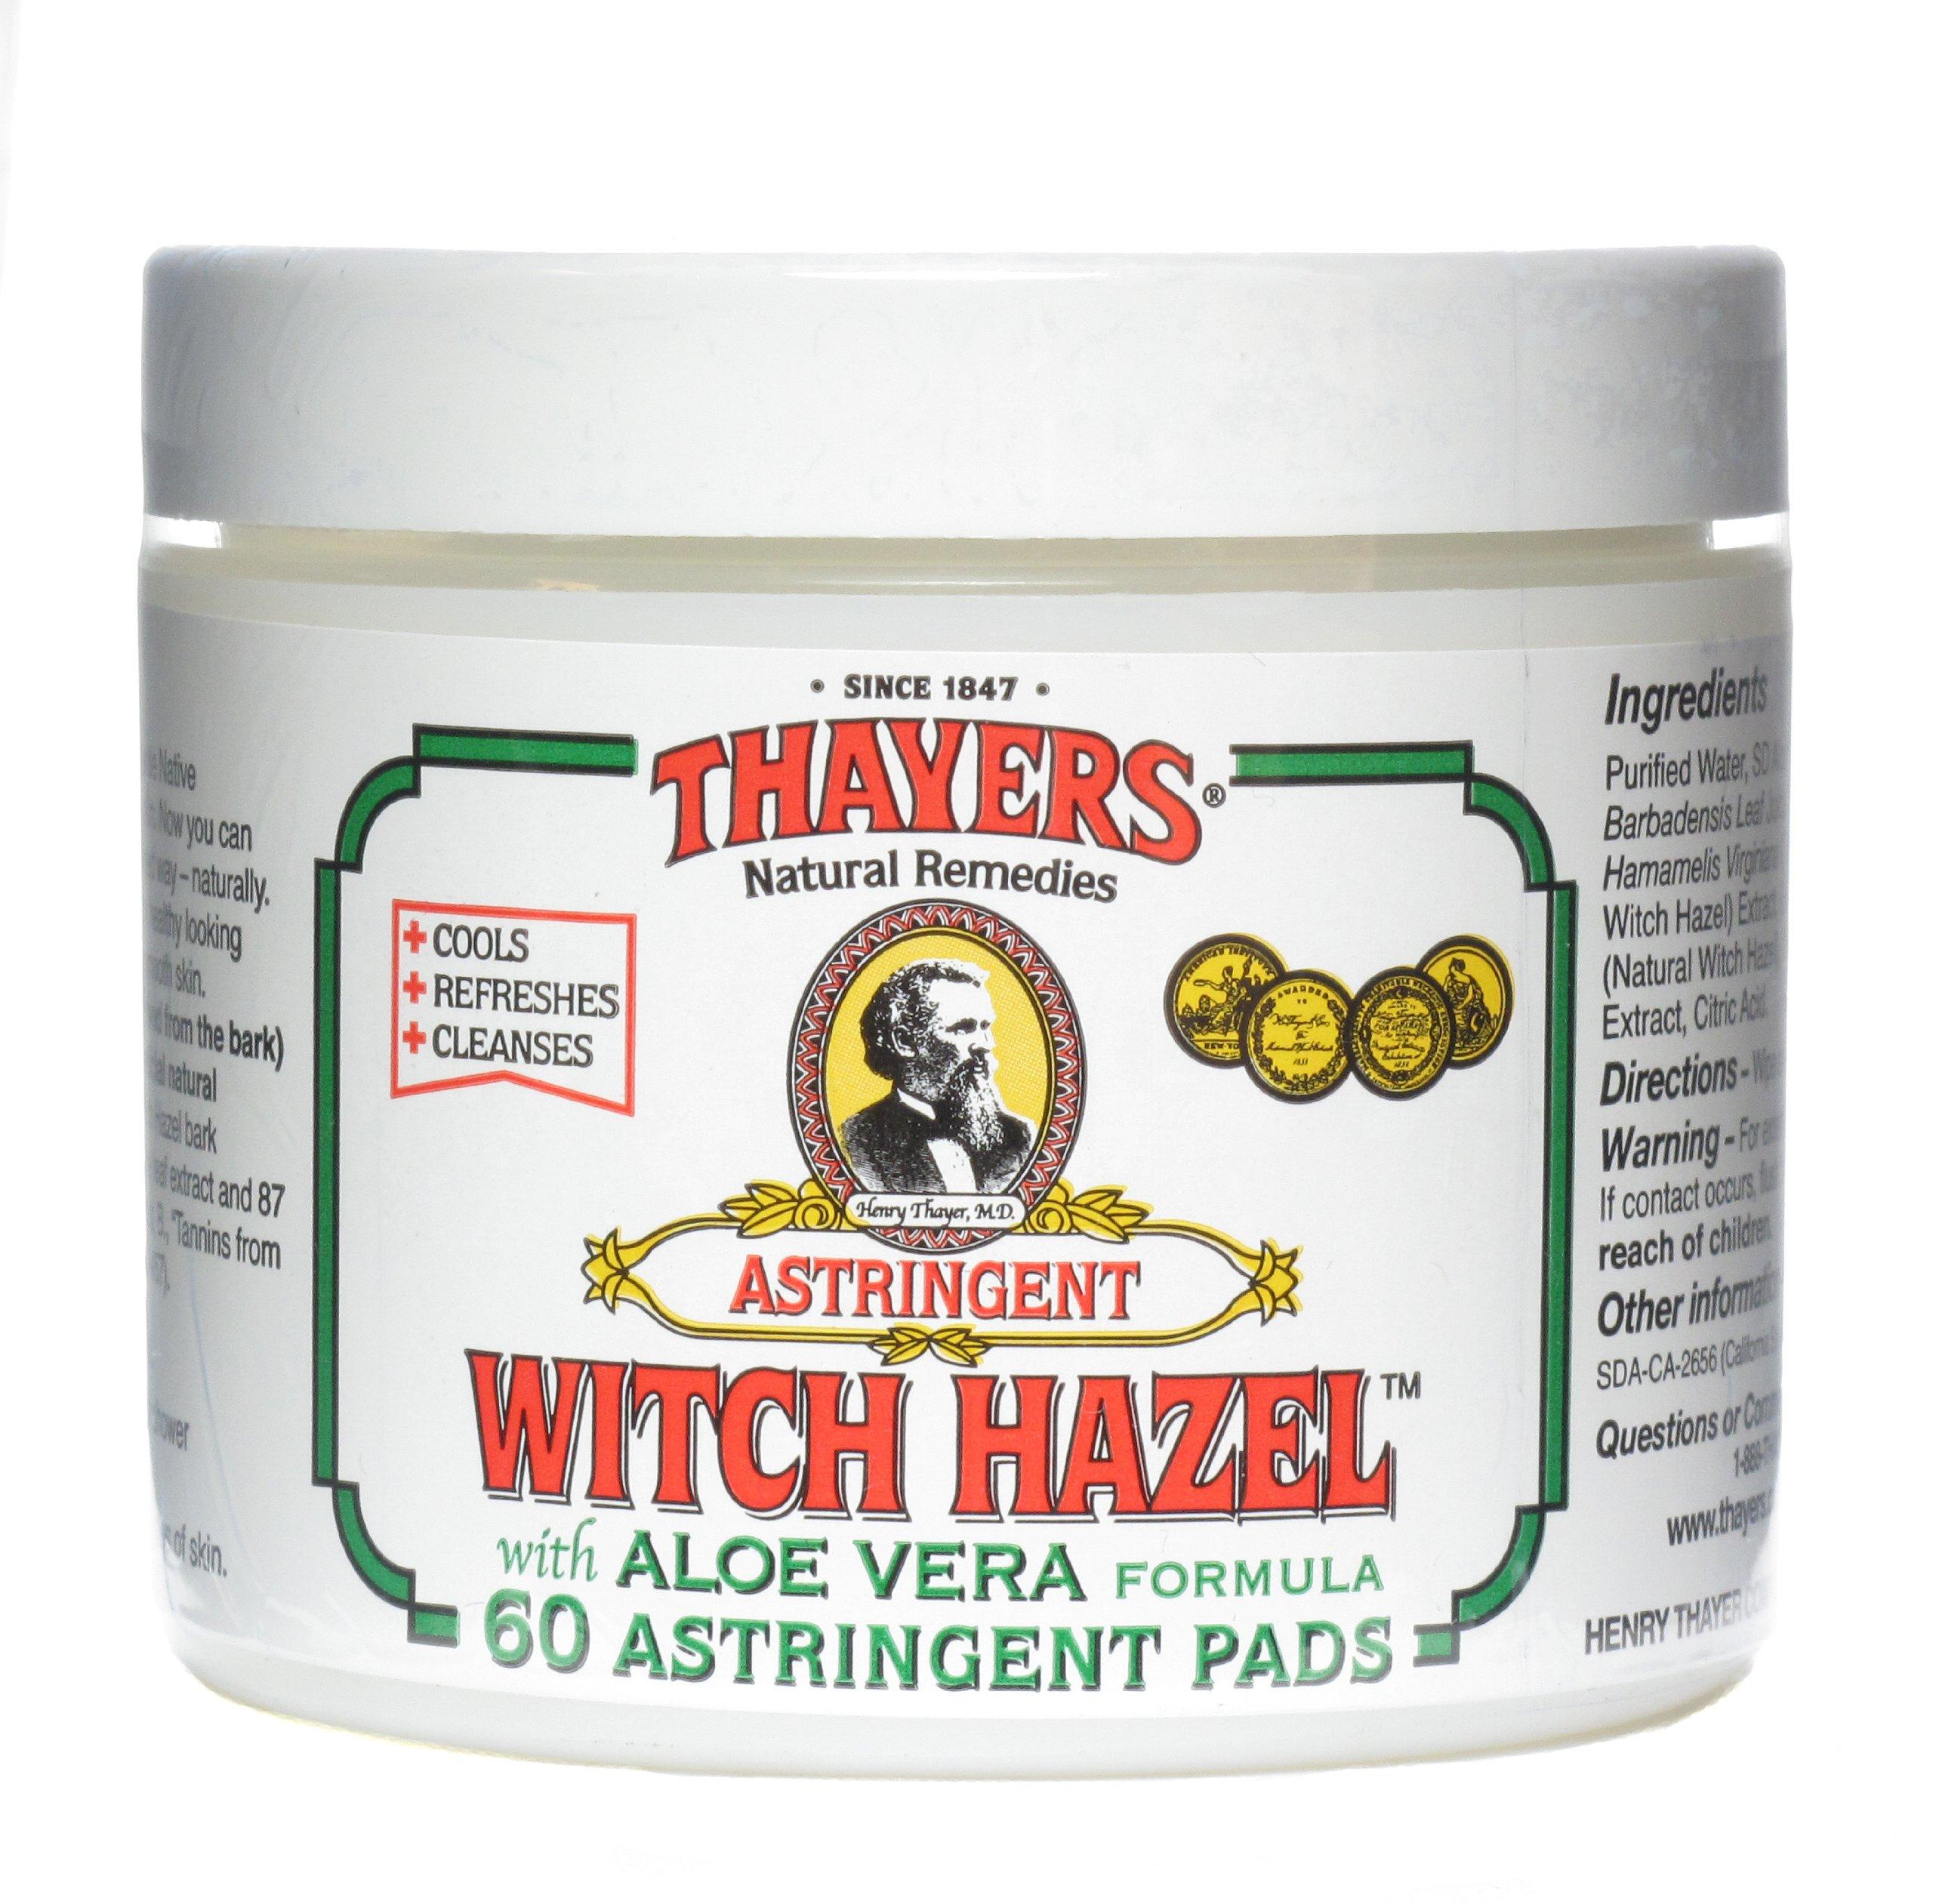 Thayers Original Witch Hazel Astringent Pads With Aloe Vera Formula - 60 Ct